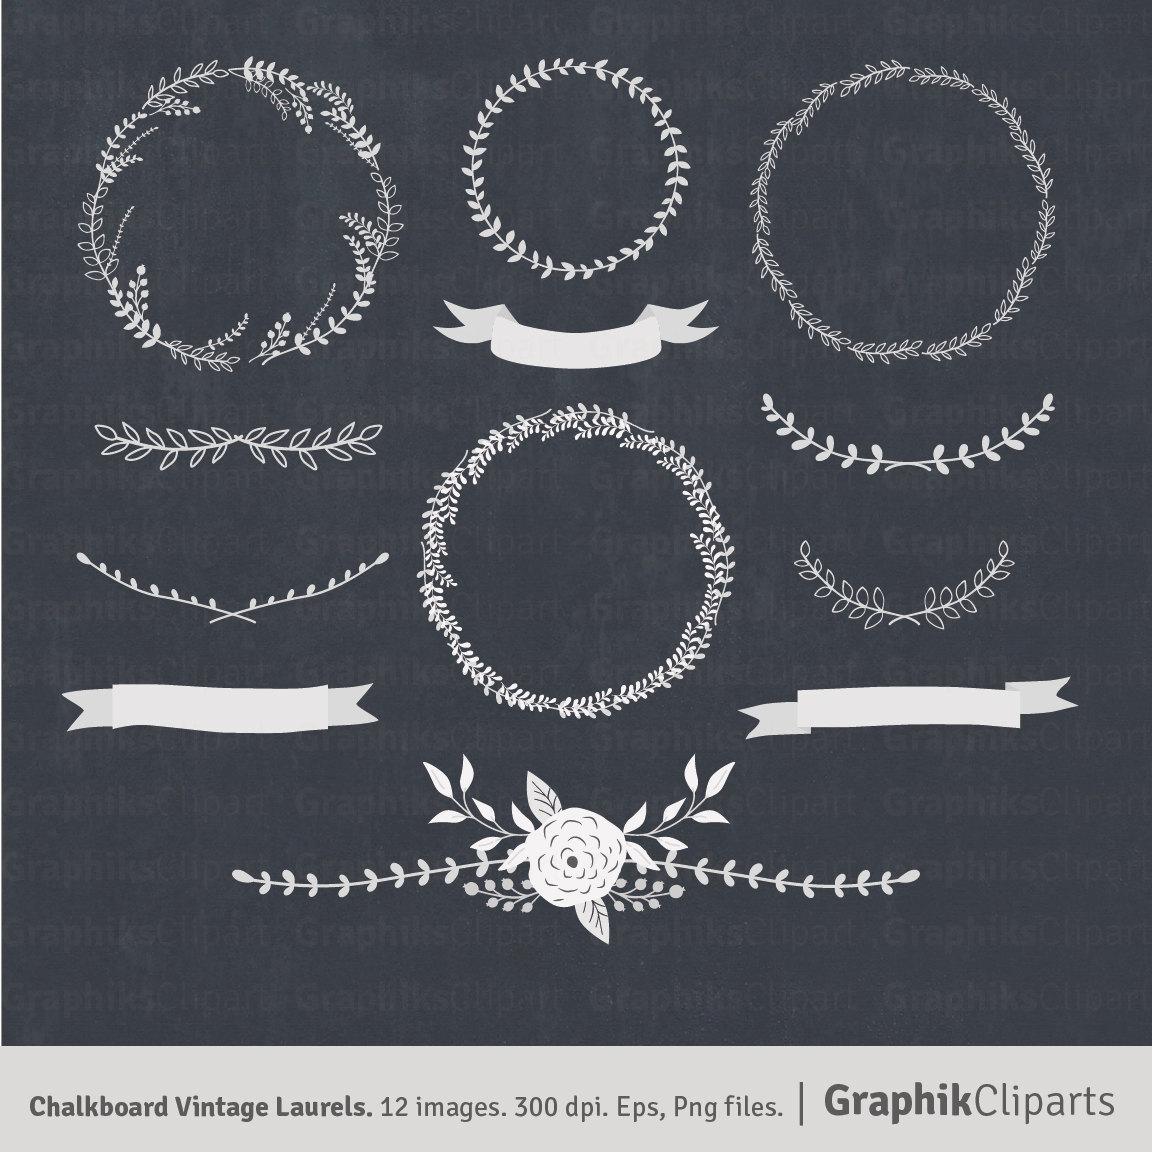 Chalkboard wreath clipart vector free Chalkboard wreath clipart - ClipartFest vector free